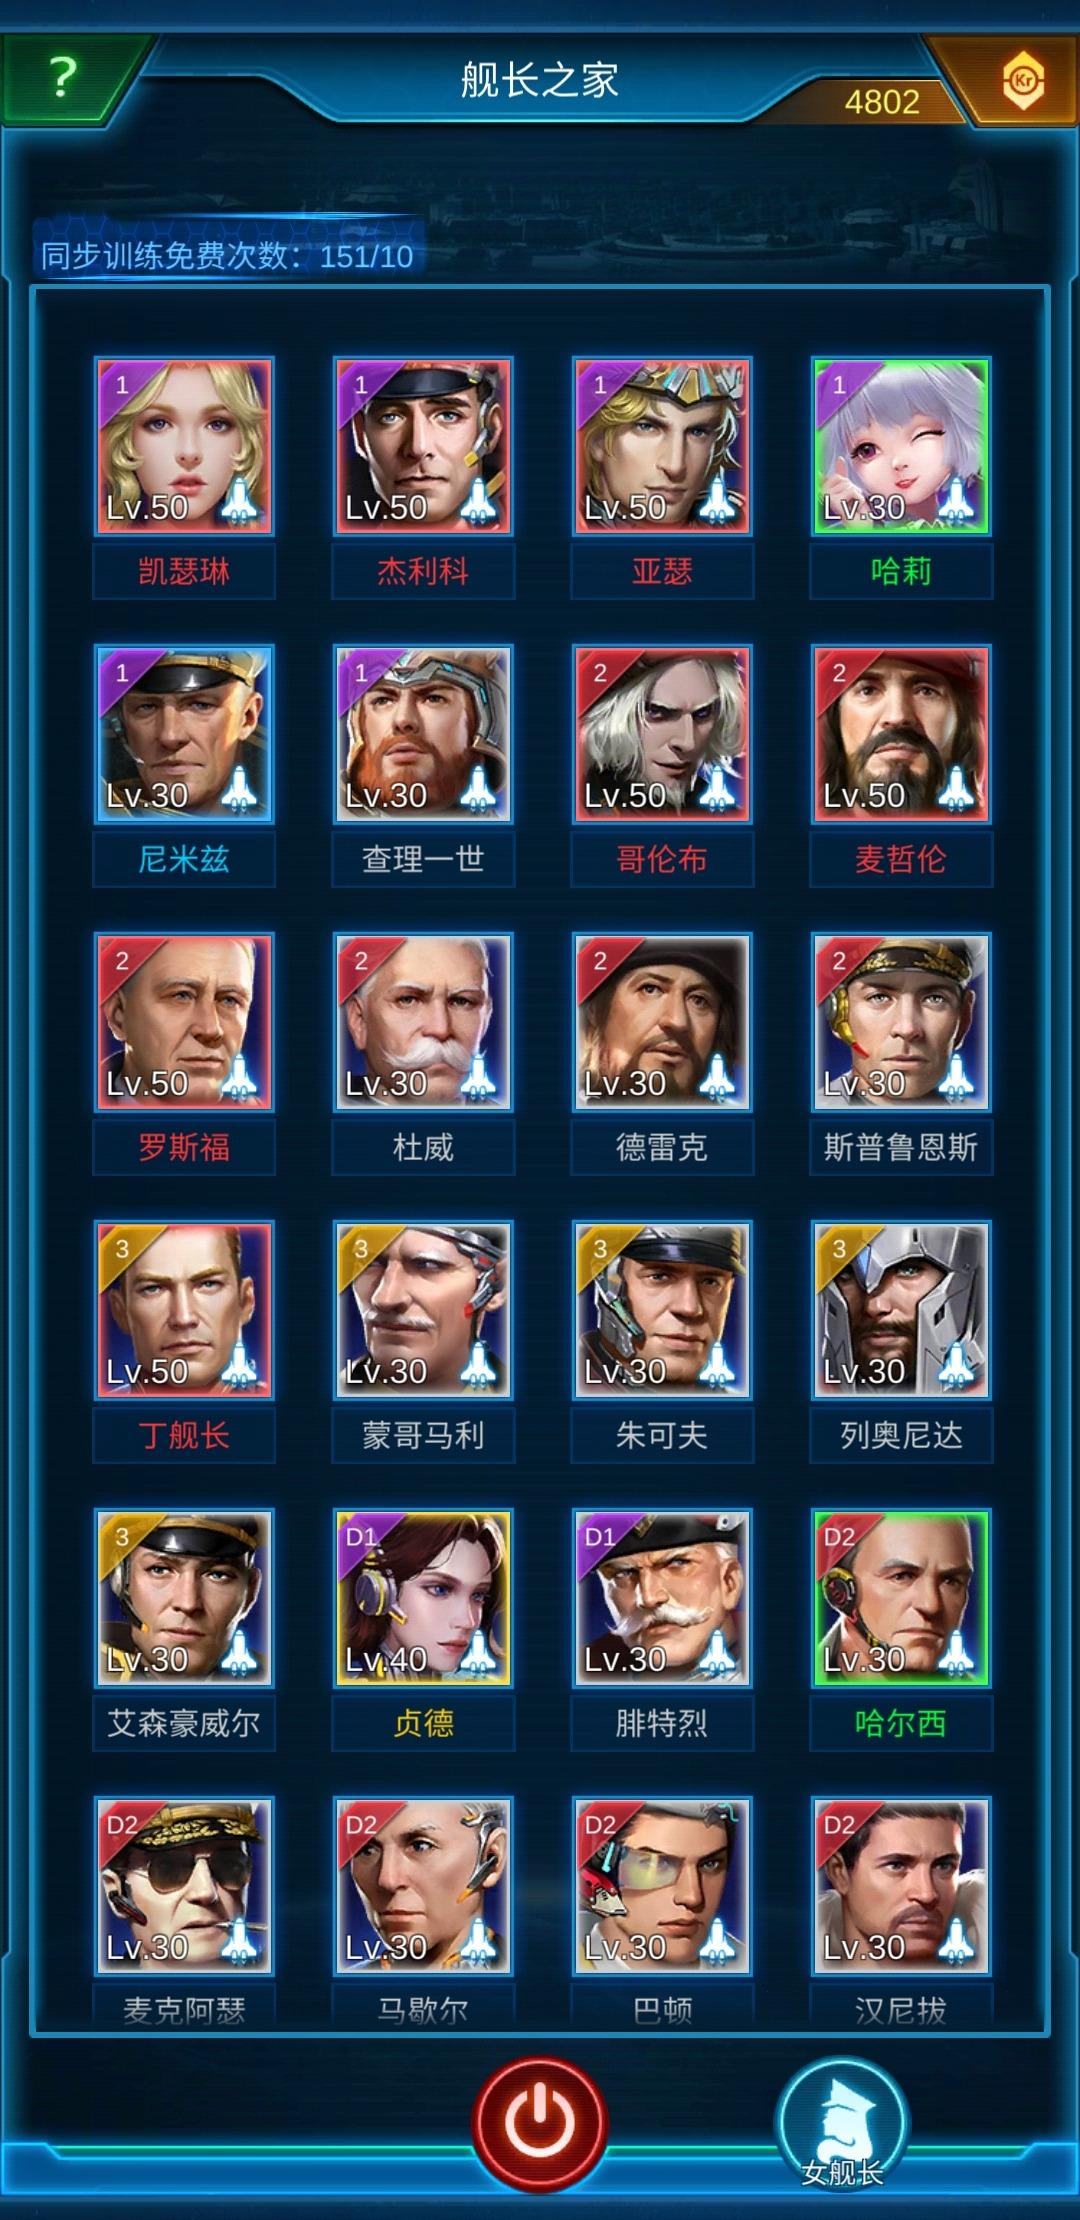 Screenshot_20200310_222711_com.jedigames.p16s.huawei.jpg